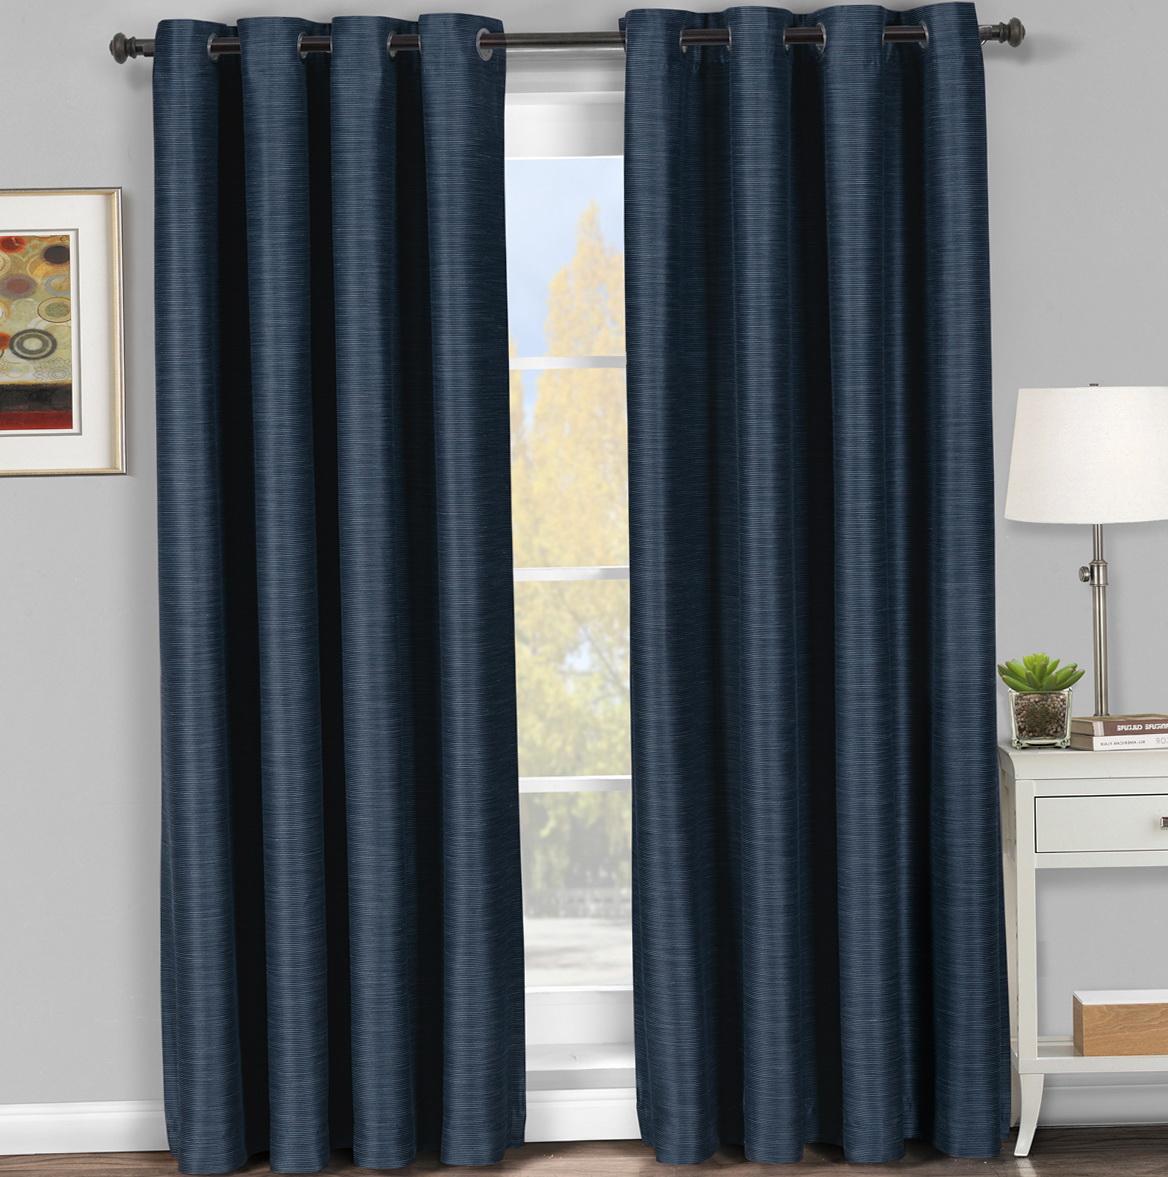 Navy Blue Blackout Curtains 96